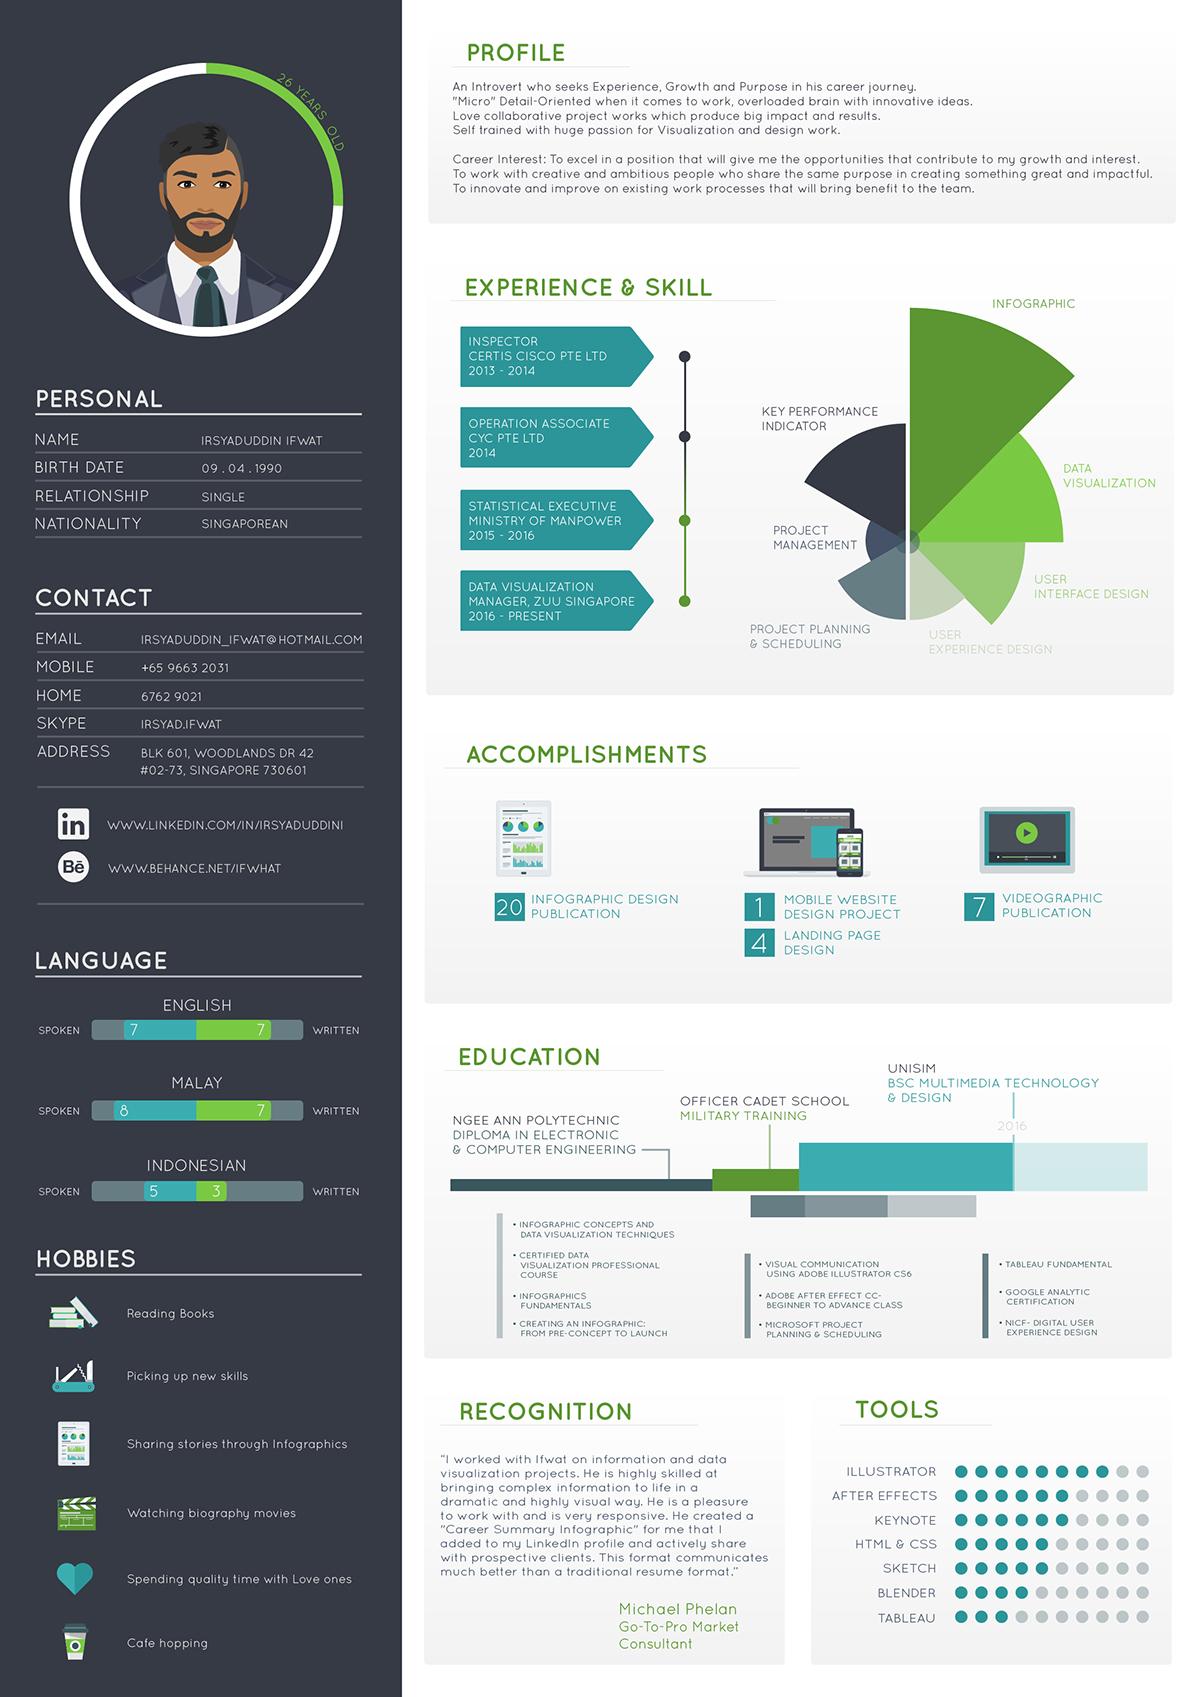 infographic resume infographic cv Creative Resume information design resume CV infographic curiculum vitae infographic data visualization